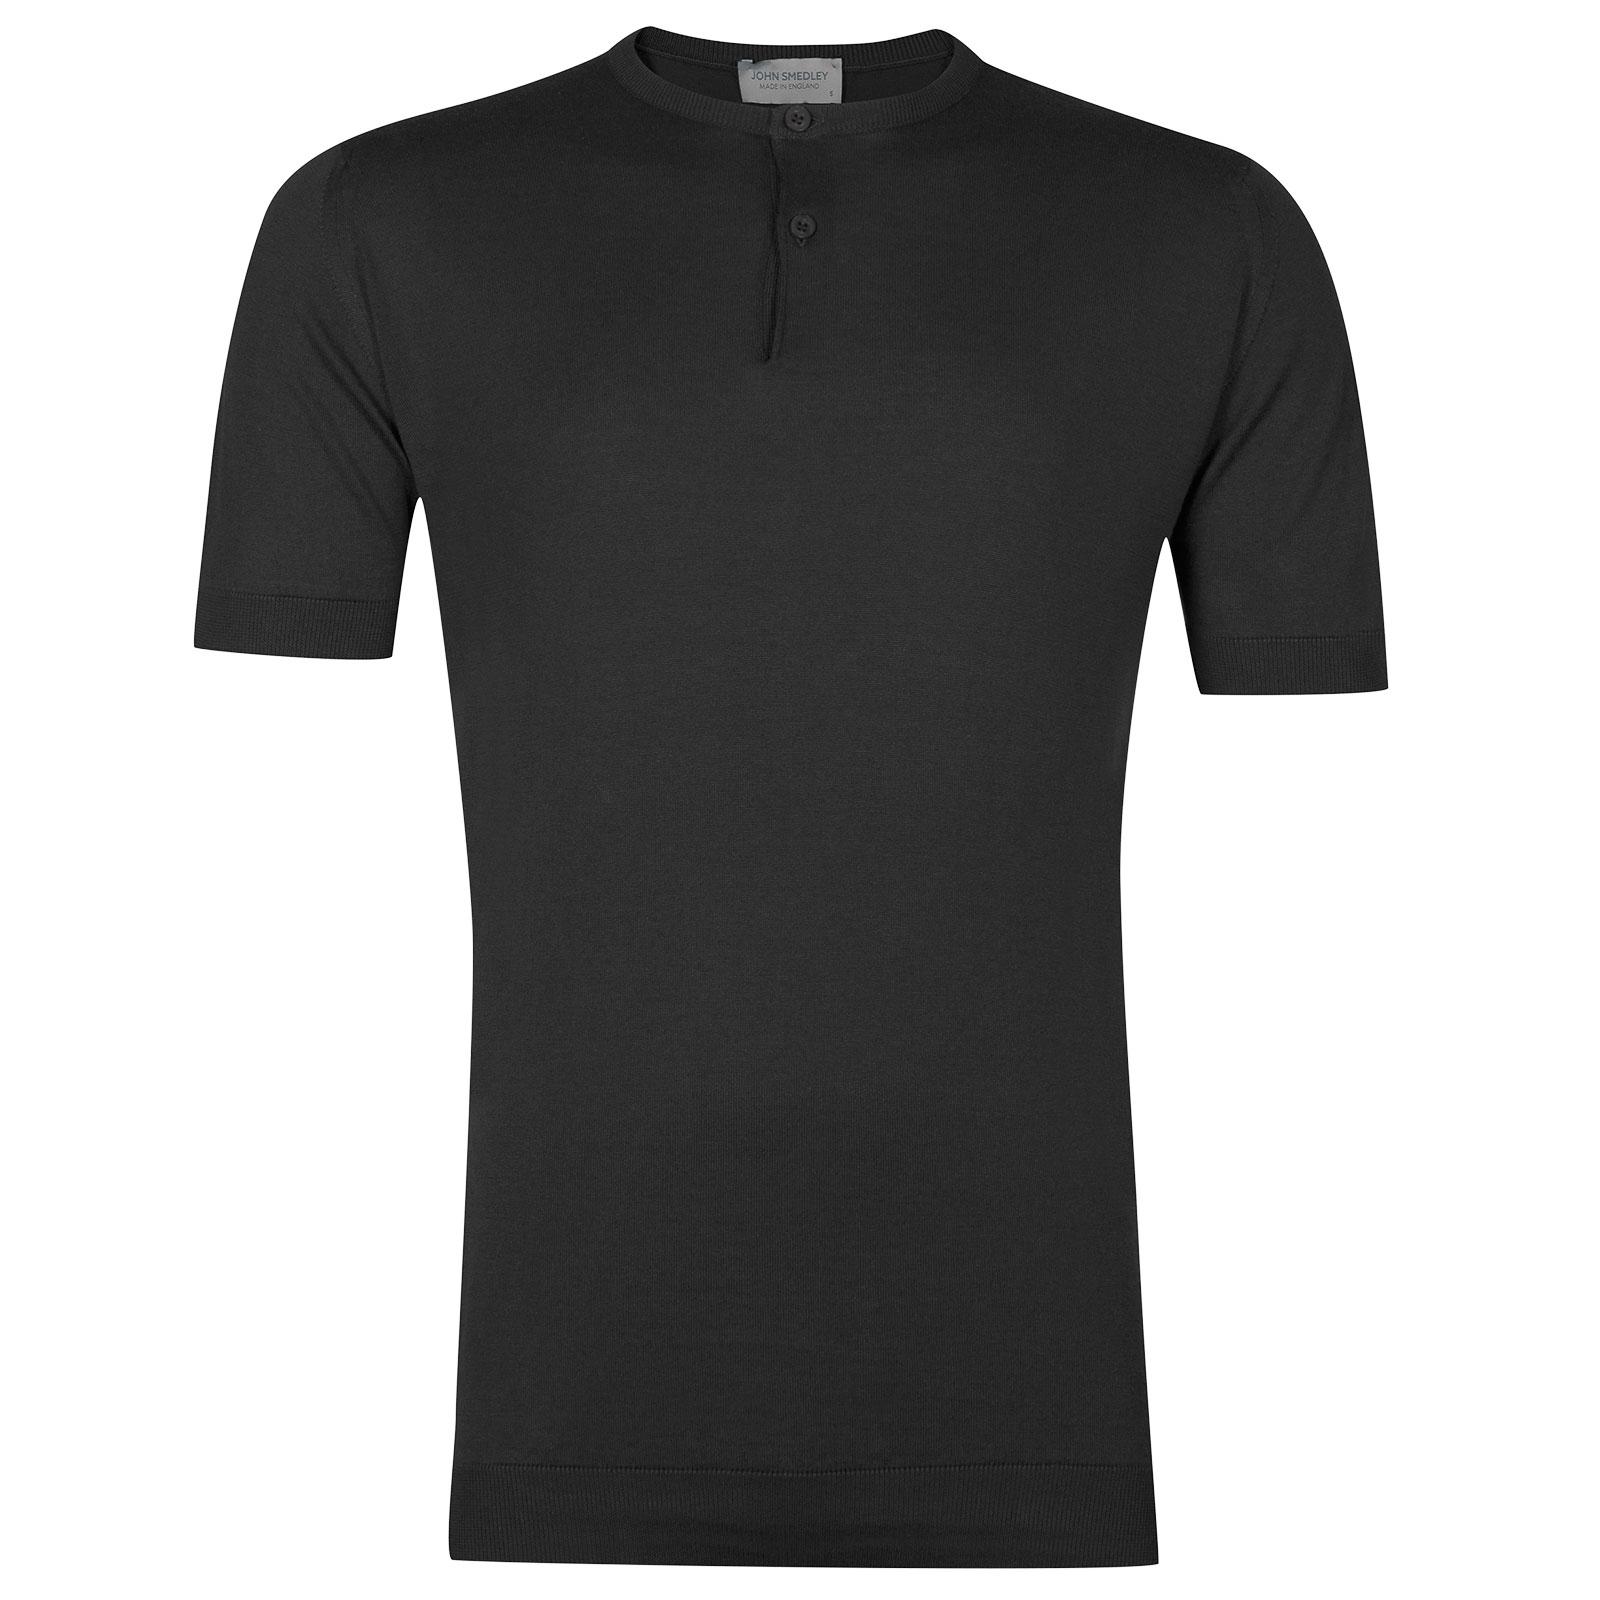 John Smedley Bennett Sea Island Cotton T-shirt in Flannel Grey-XXL